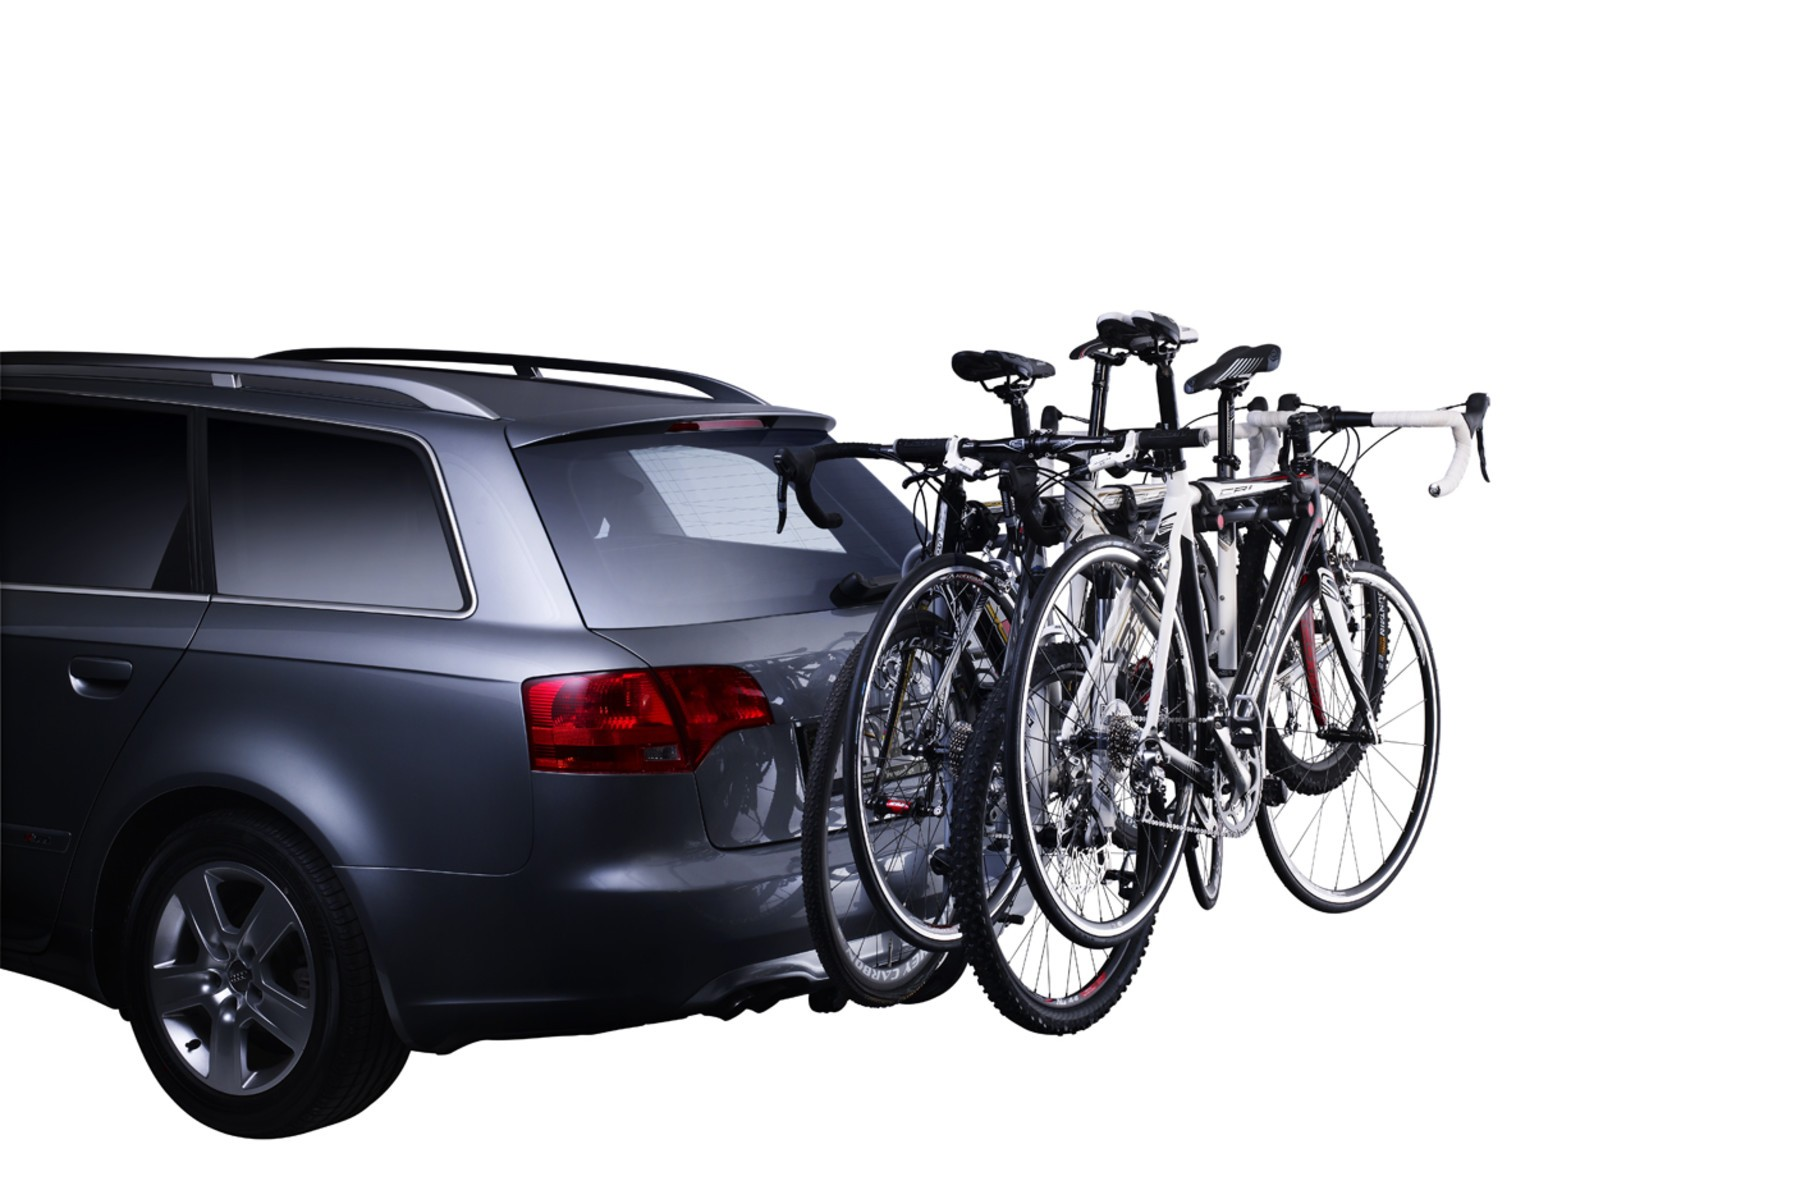 Suporte p/4 Bicicletas Thule HangOn P/ Engate 9708